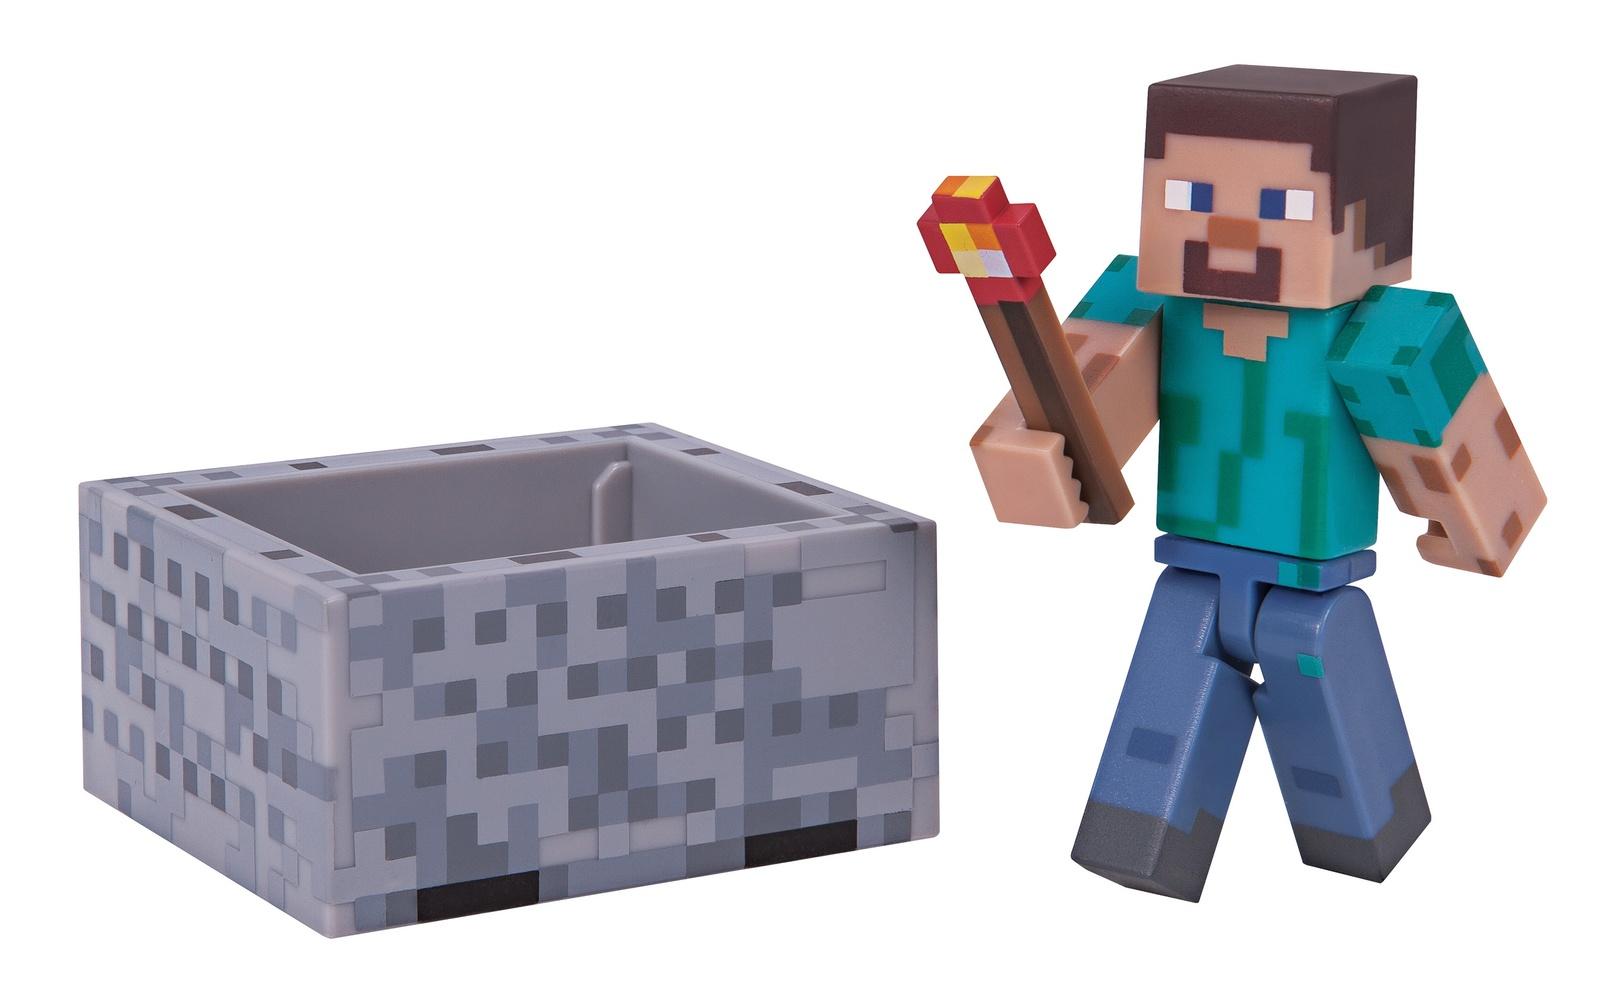 Minecraft: Series 3 Action Figure (Minecart Steve) image